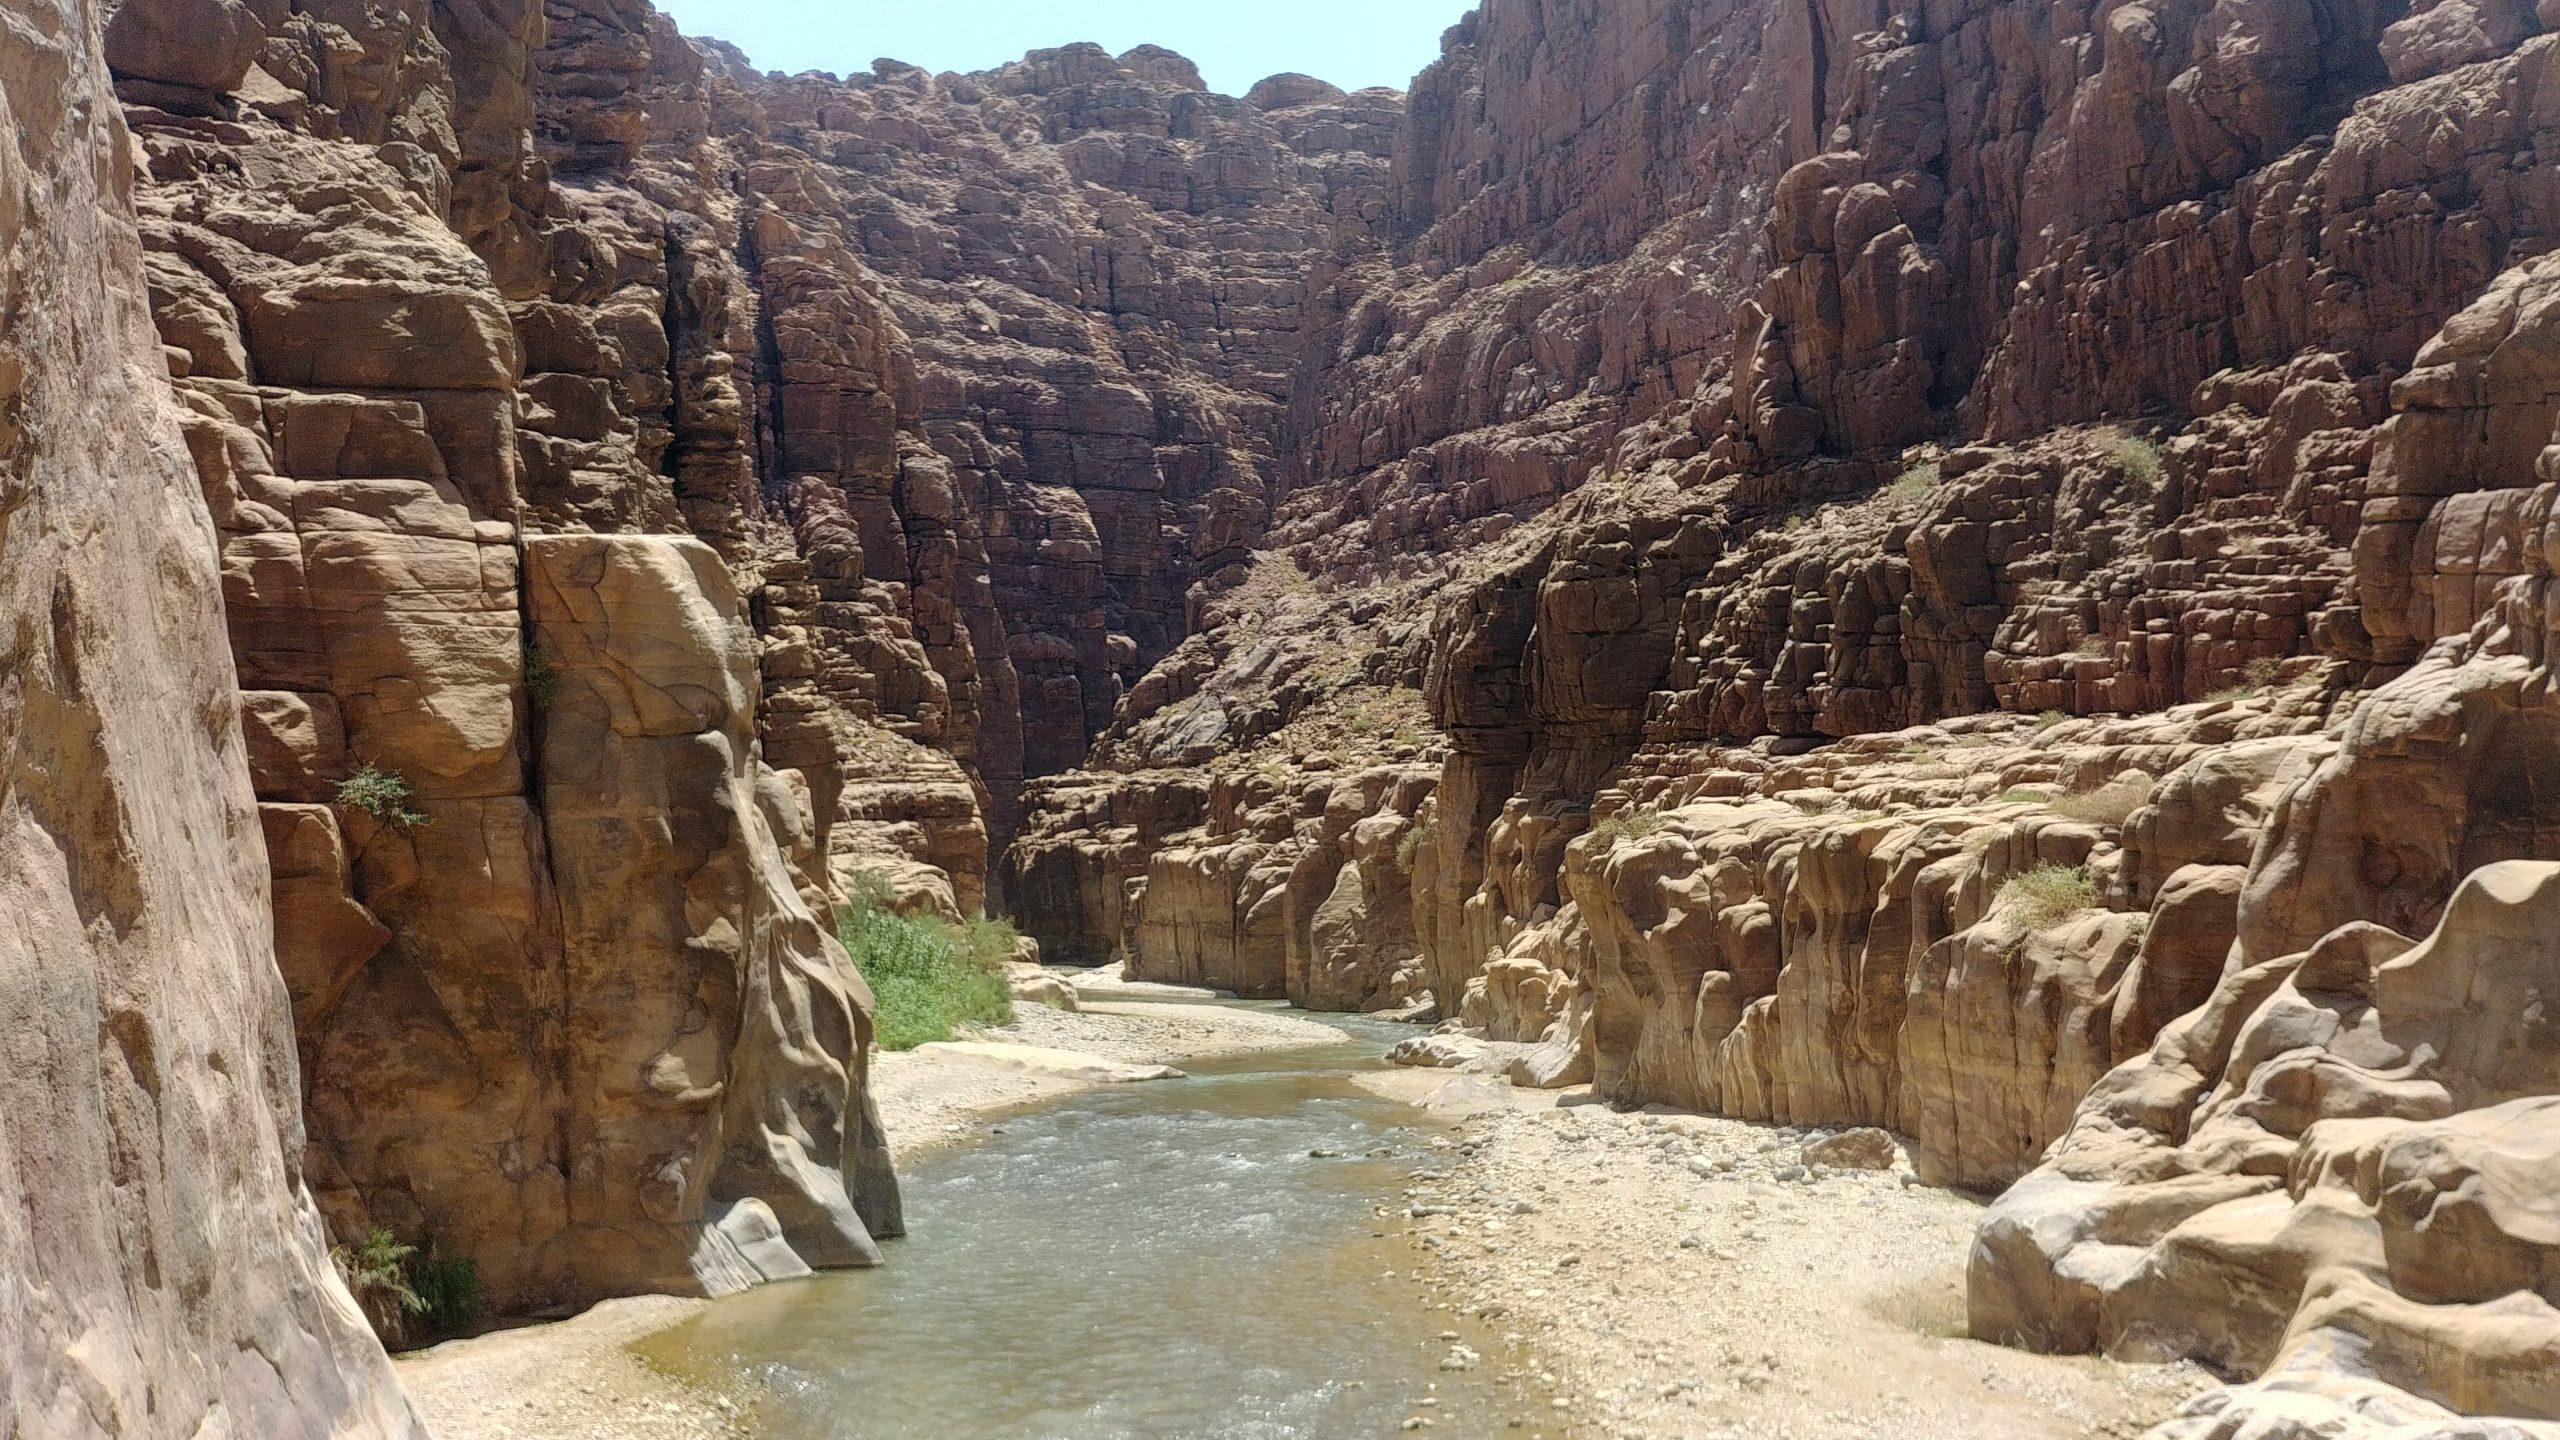 Jordanie - Randonnée aquatique canyoning dans le Wadi Mujib